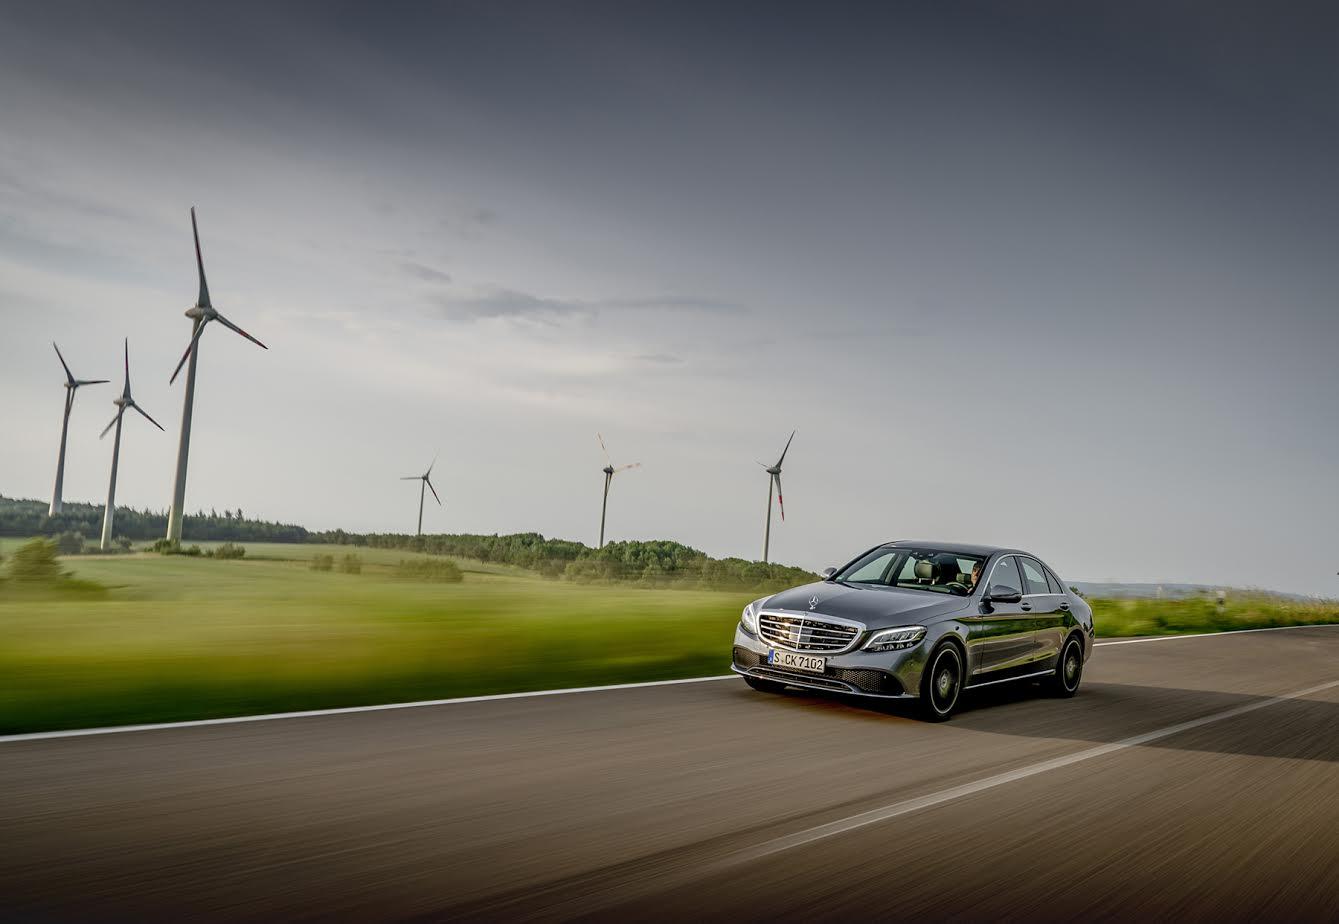 Mercedes-Benz C200 Limousine, selenitgrau metallic designo, Leder Nappa zweifarbig platinweiß pearl/schwarz.;Kraftstoffverbrauch kombiniert: 6,3-6,0 l/100 km; CO2-Emissionen kombiniert: 144-136 g/km*Mercedes-Benz C200 Sedan, selenite grey metallic Two-tone designo nappa leather platinum white pearl/black.;Fuel consumption combined: 6.3-6.0 l/100 km; Combined CO2 emissions: 144-136 g/km*